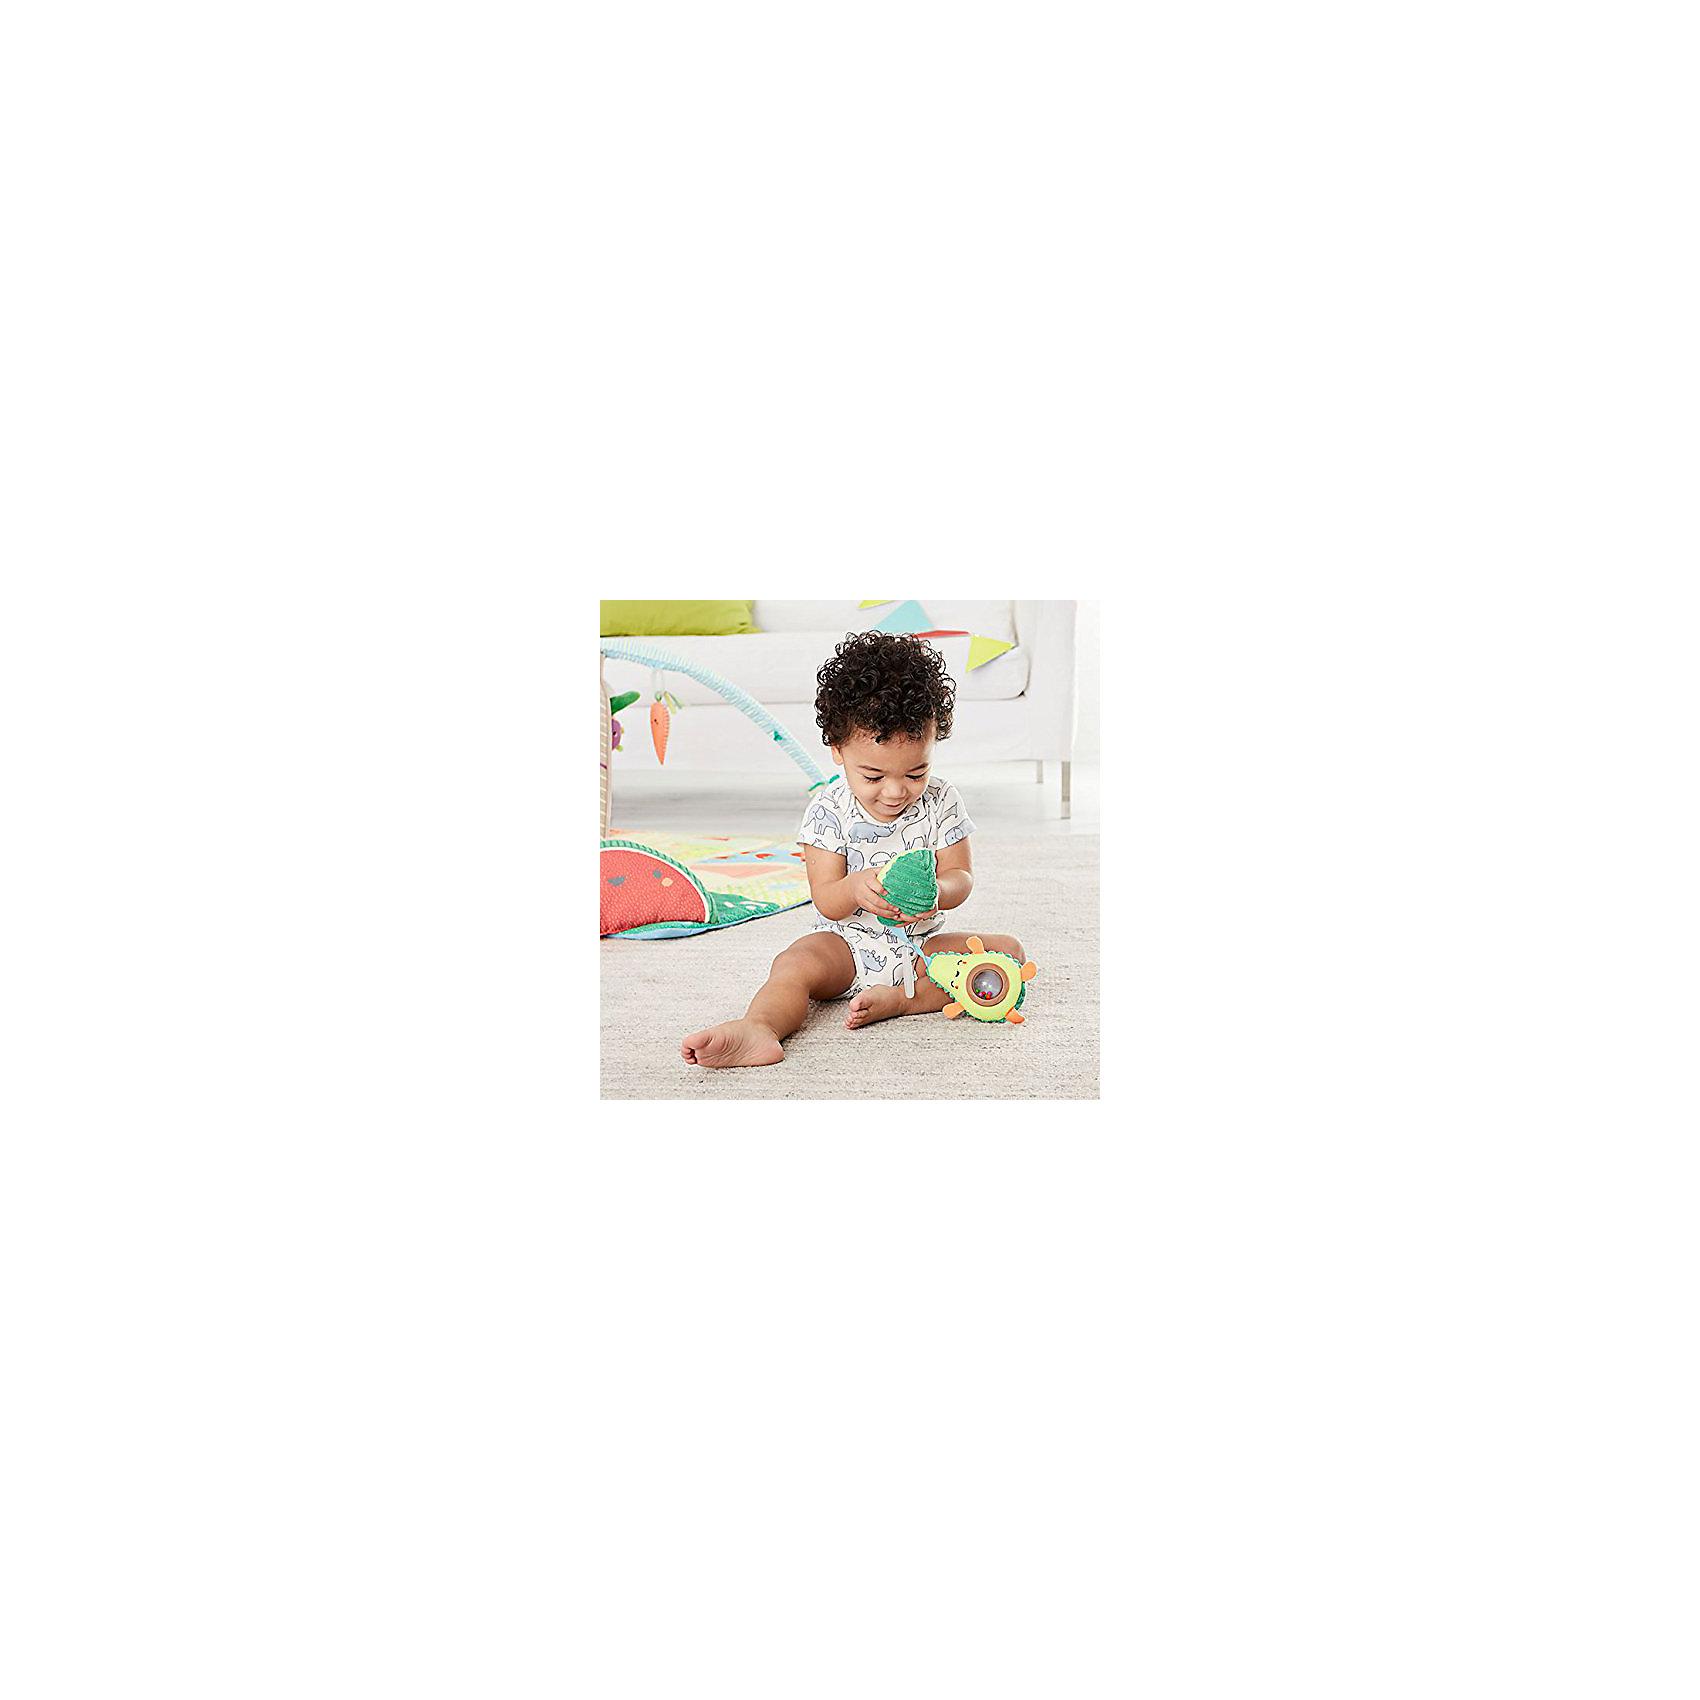 Neu Skip Hop Kinderwagen-Spielzeug Avocado 10352549 grün